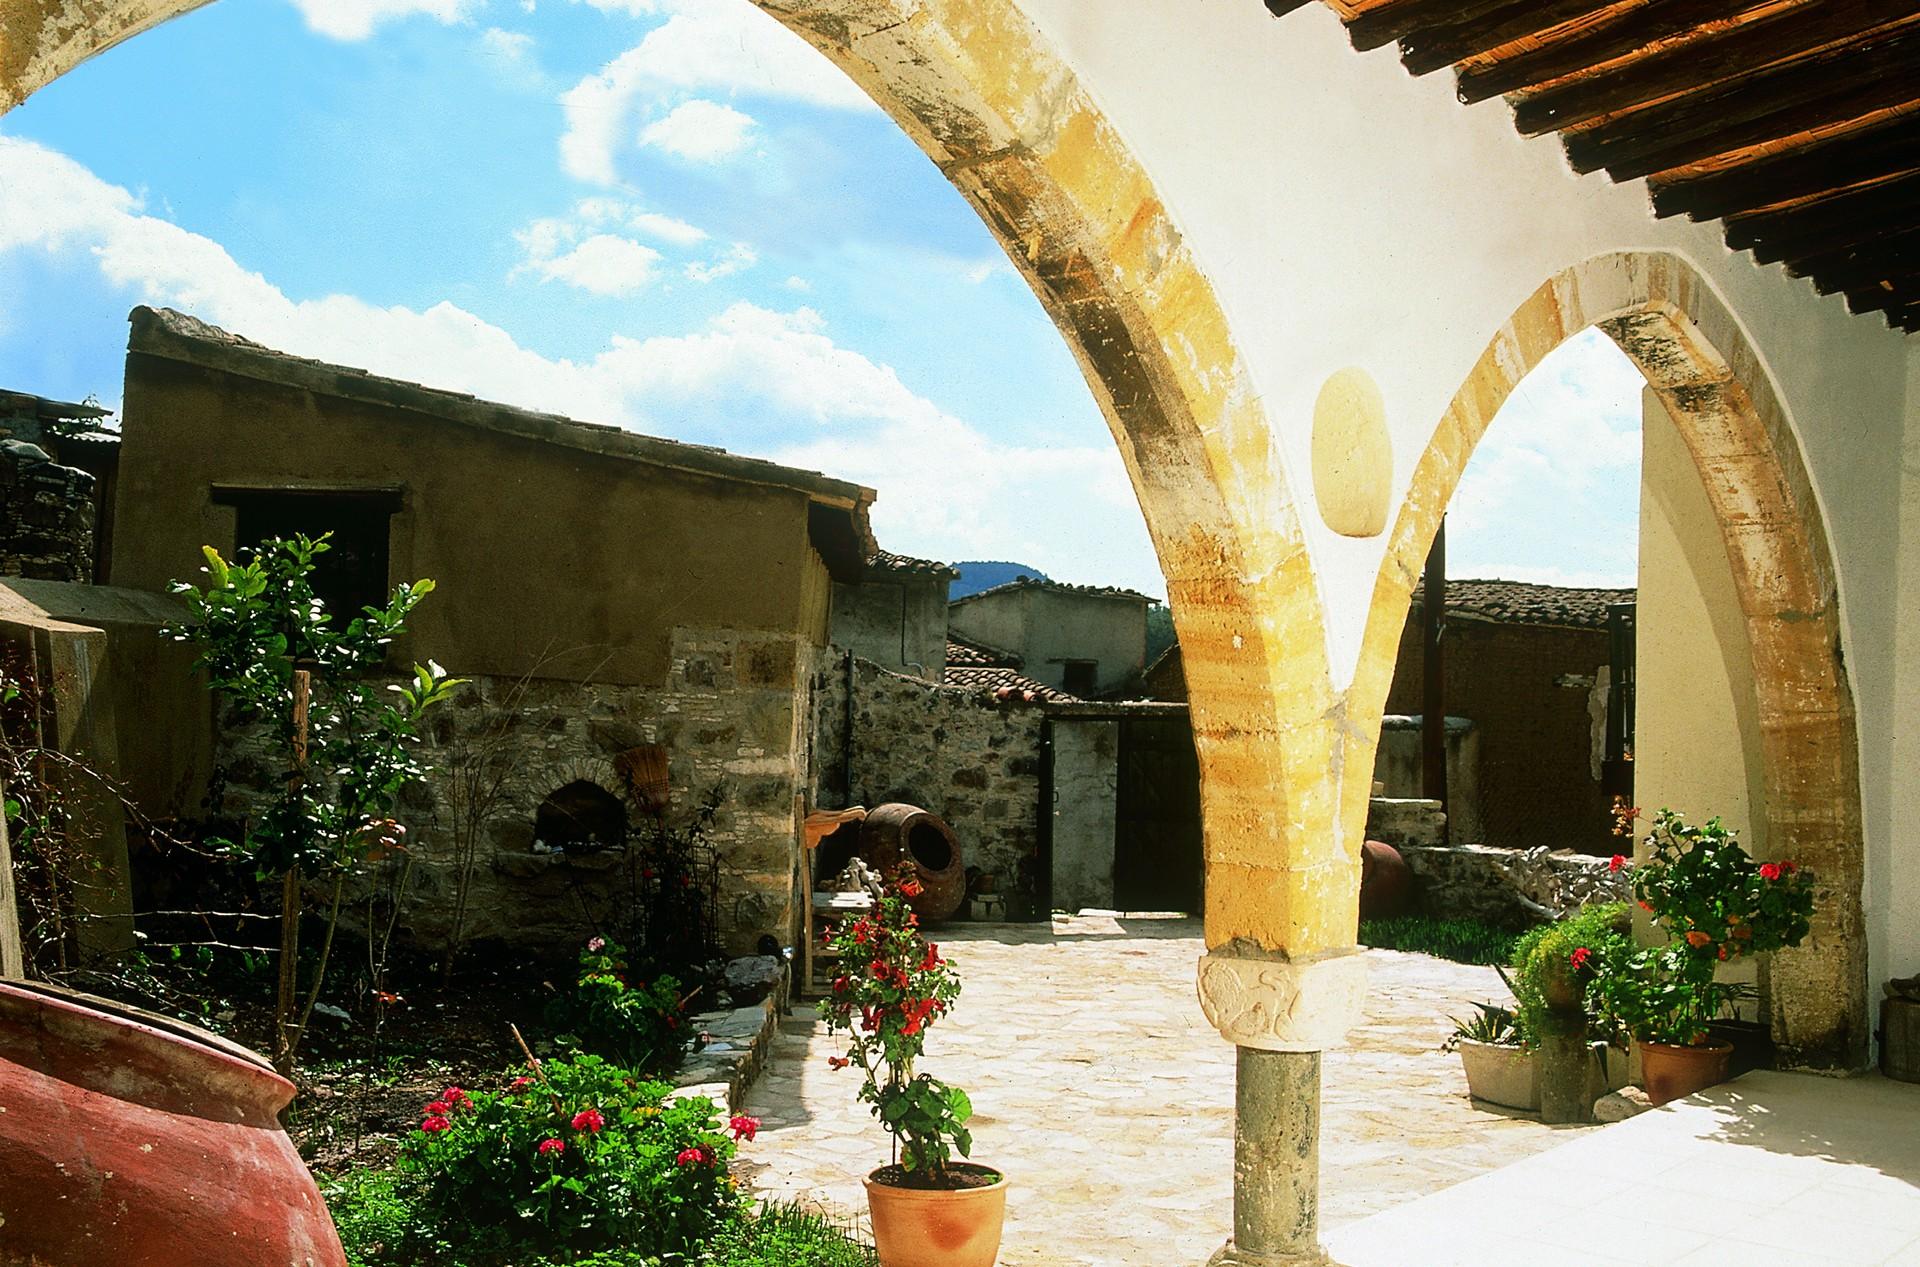 Explore the Hidden Charm of Cyprus